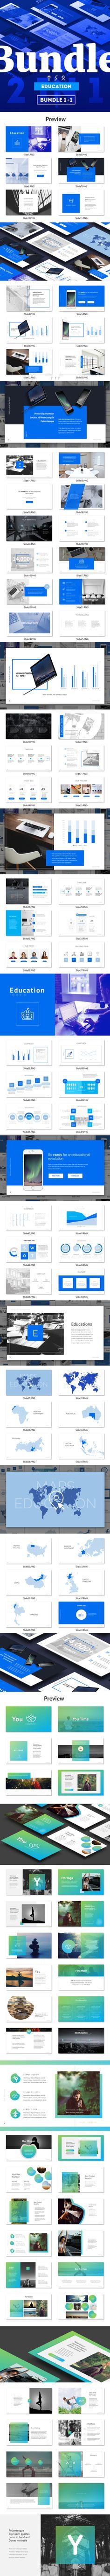 Poster design powerpoint - Bundle 1 1 Powerpoint Education